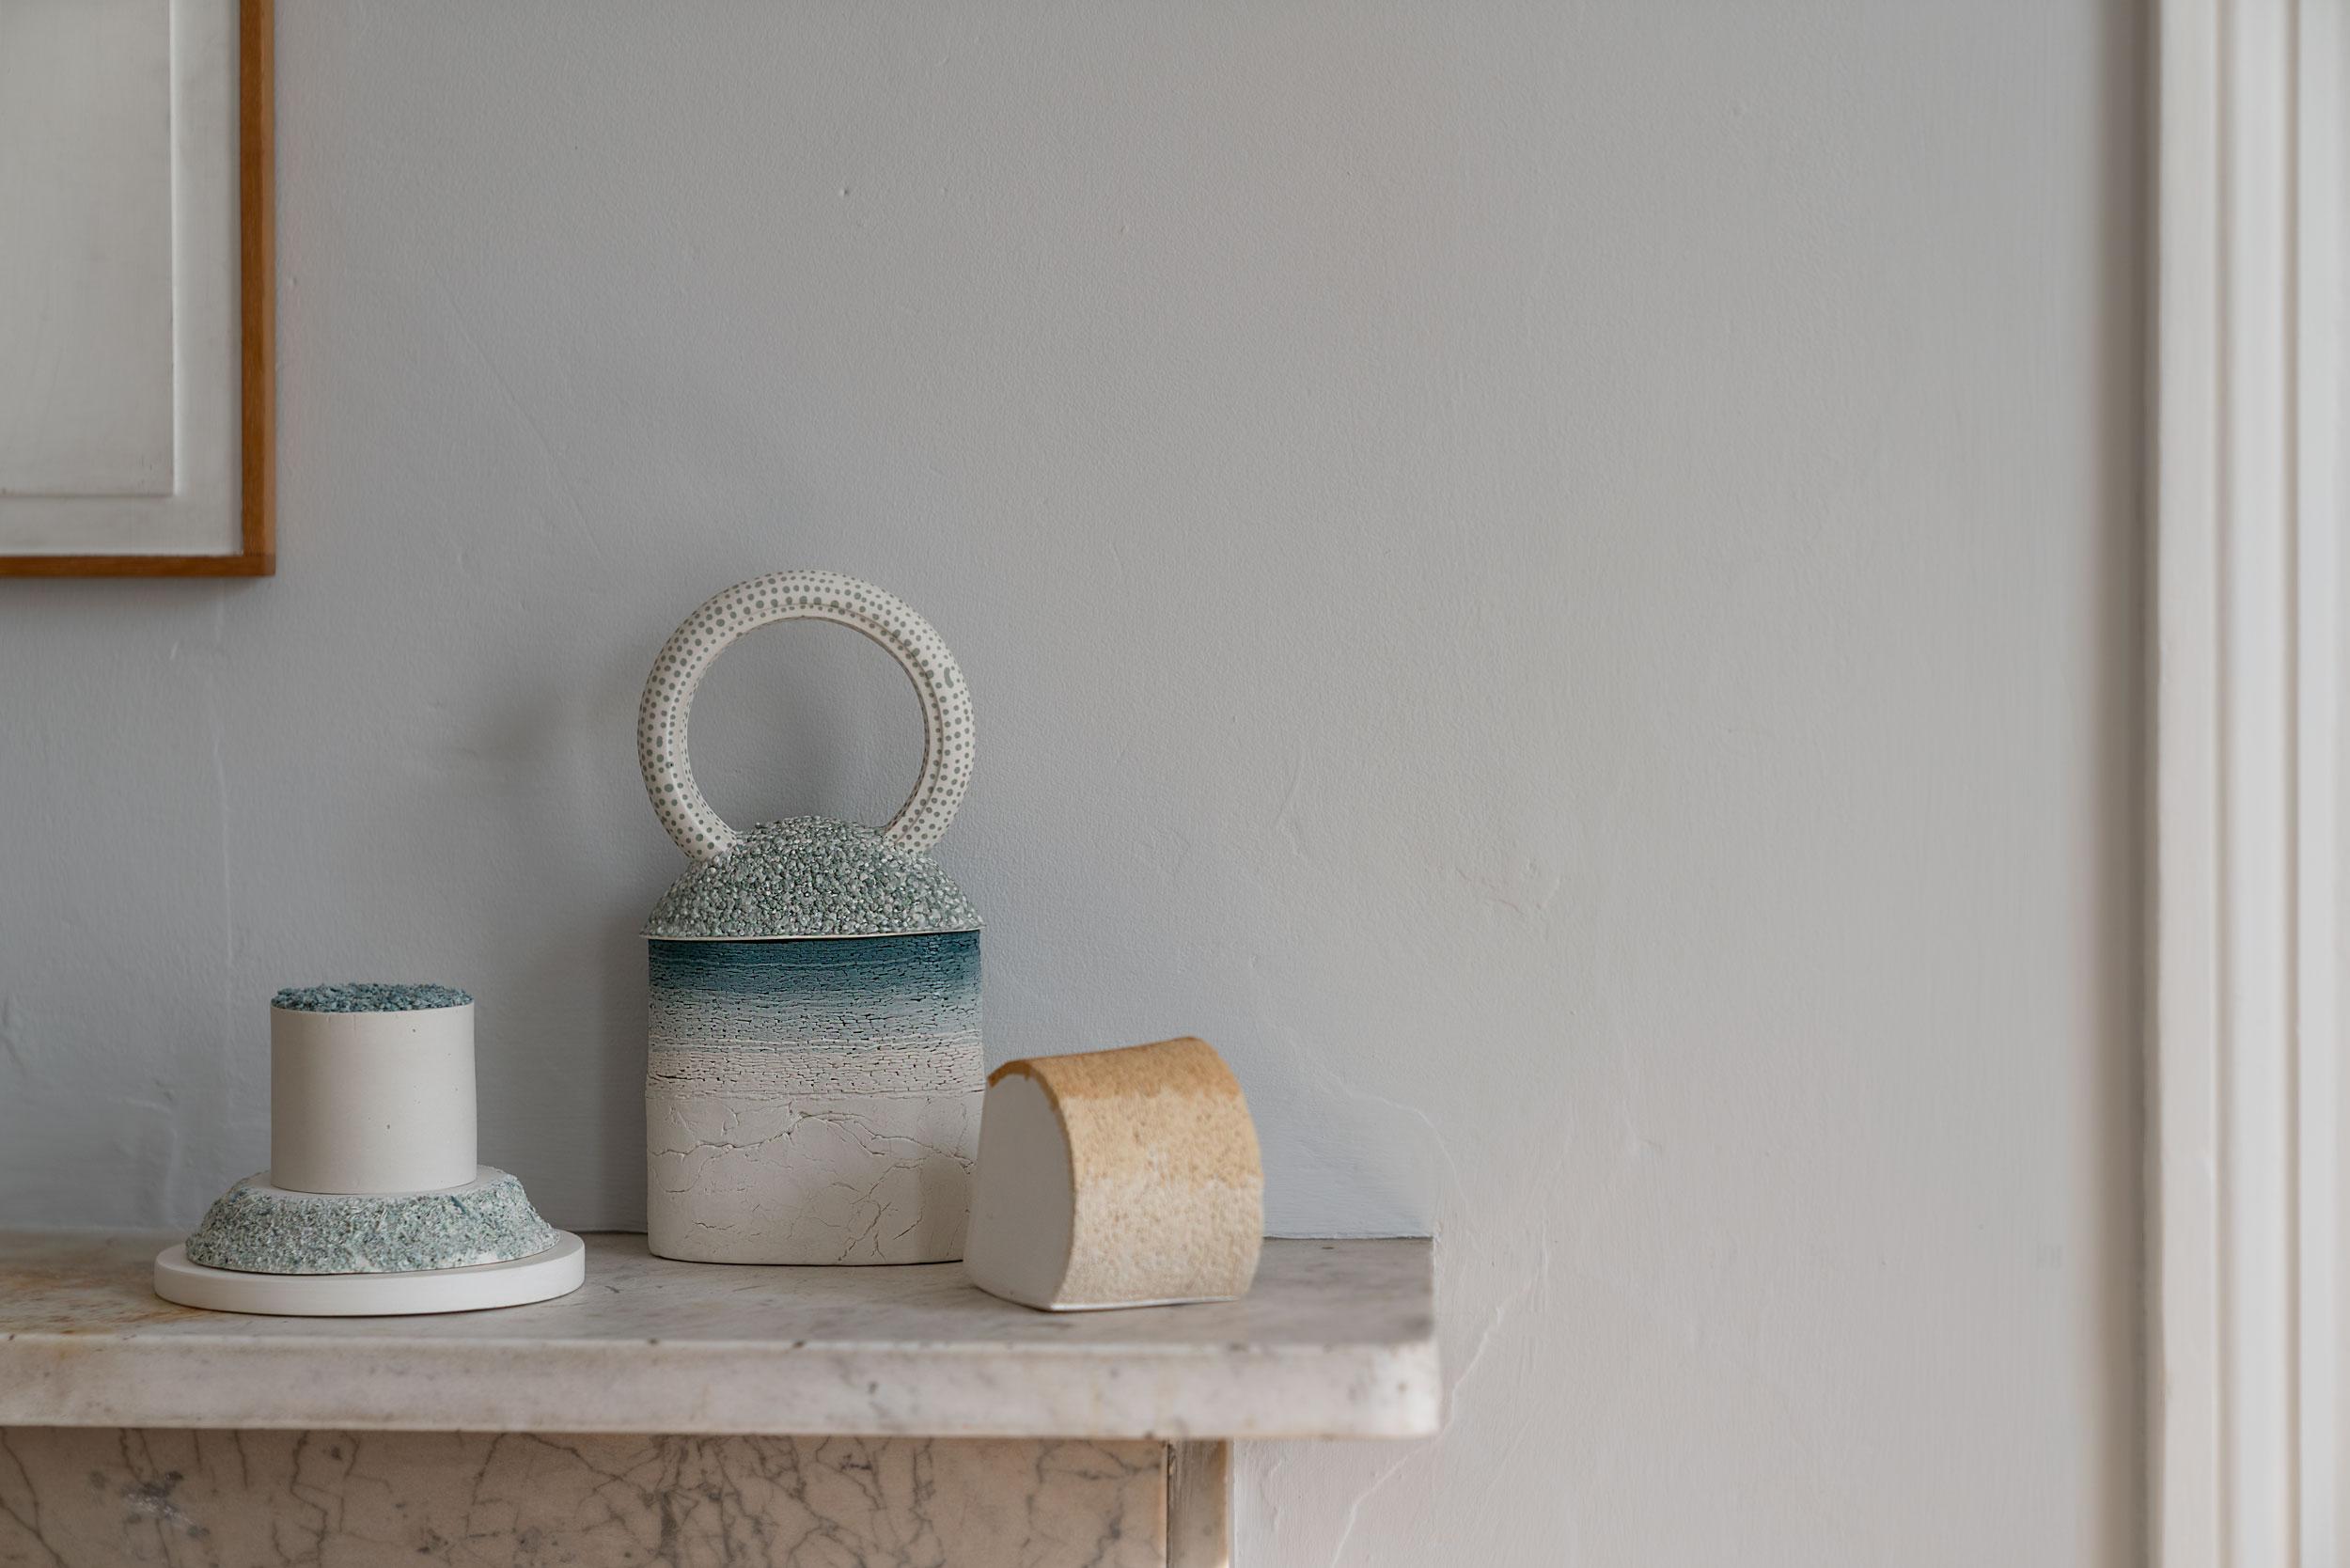 Fiona-Burrage-Photography-Caroline-Fisher-Ceramics.jpg